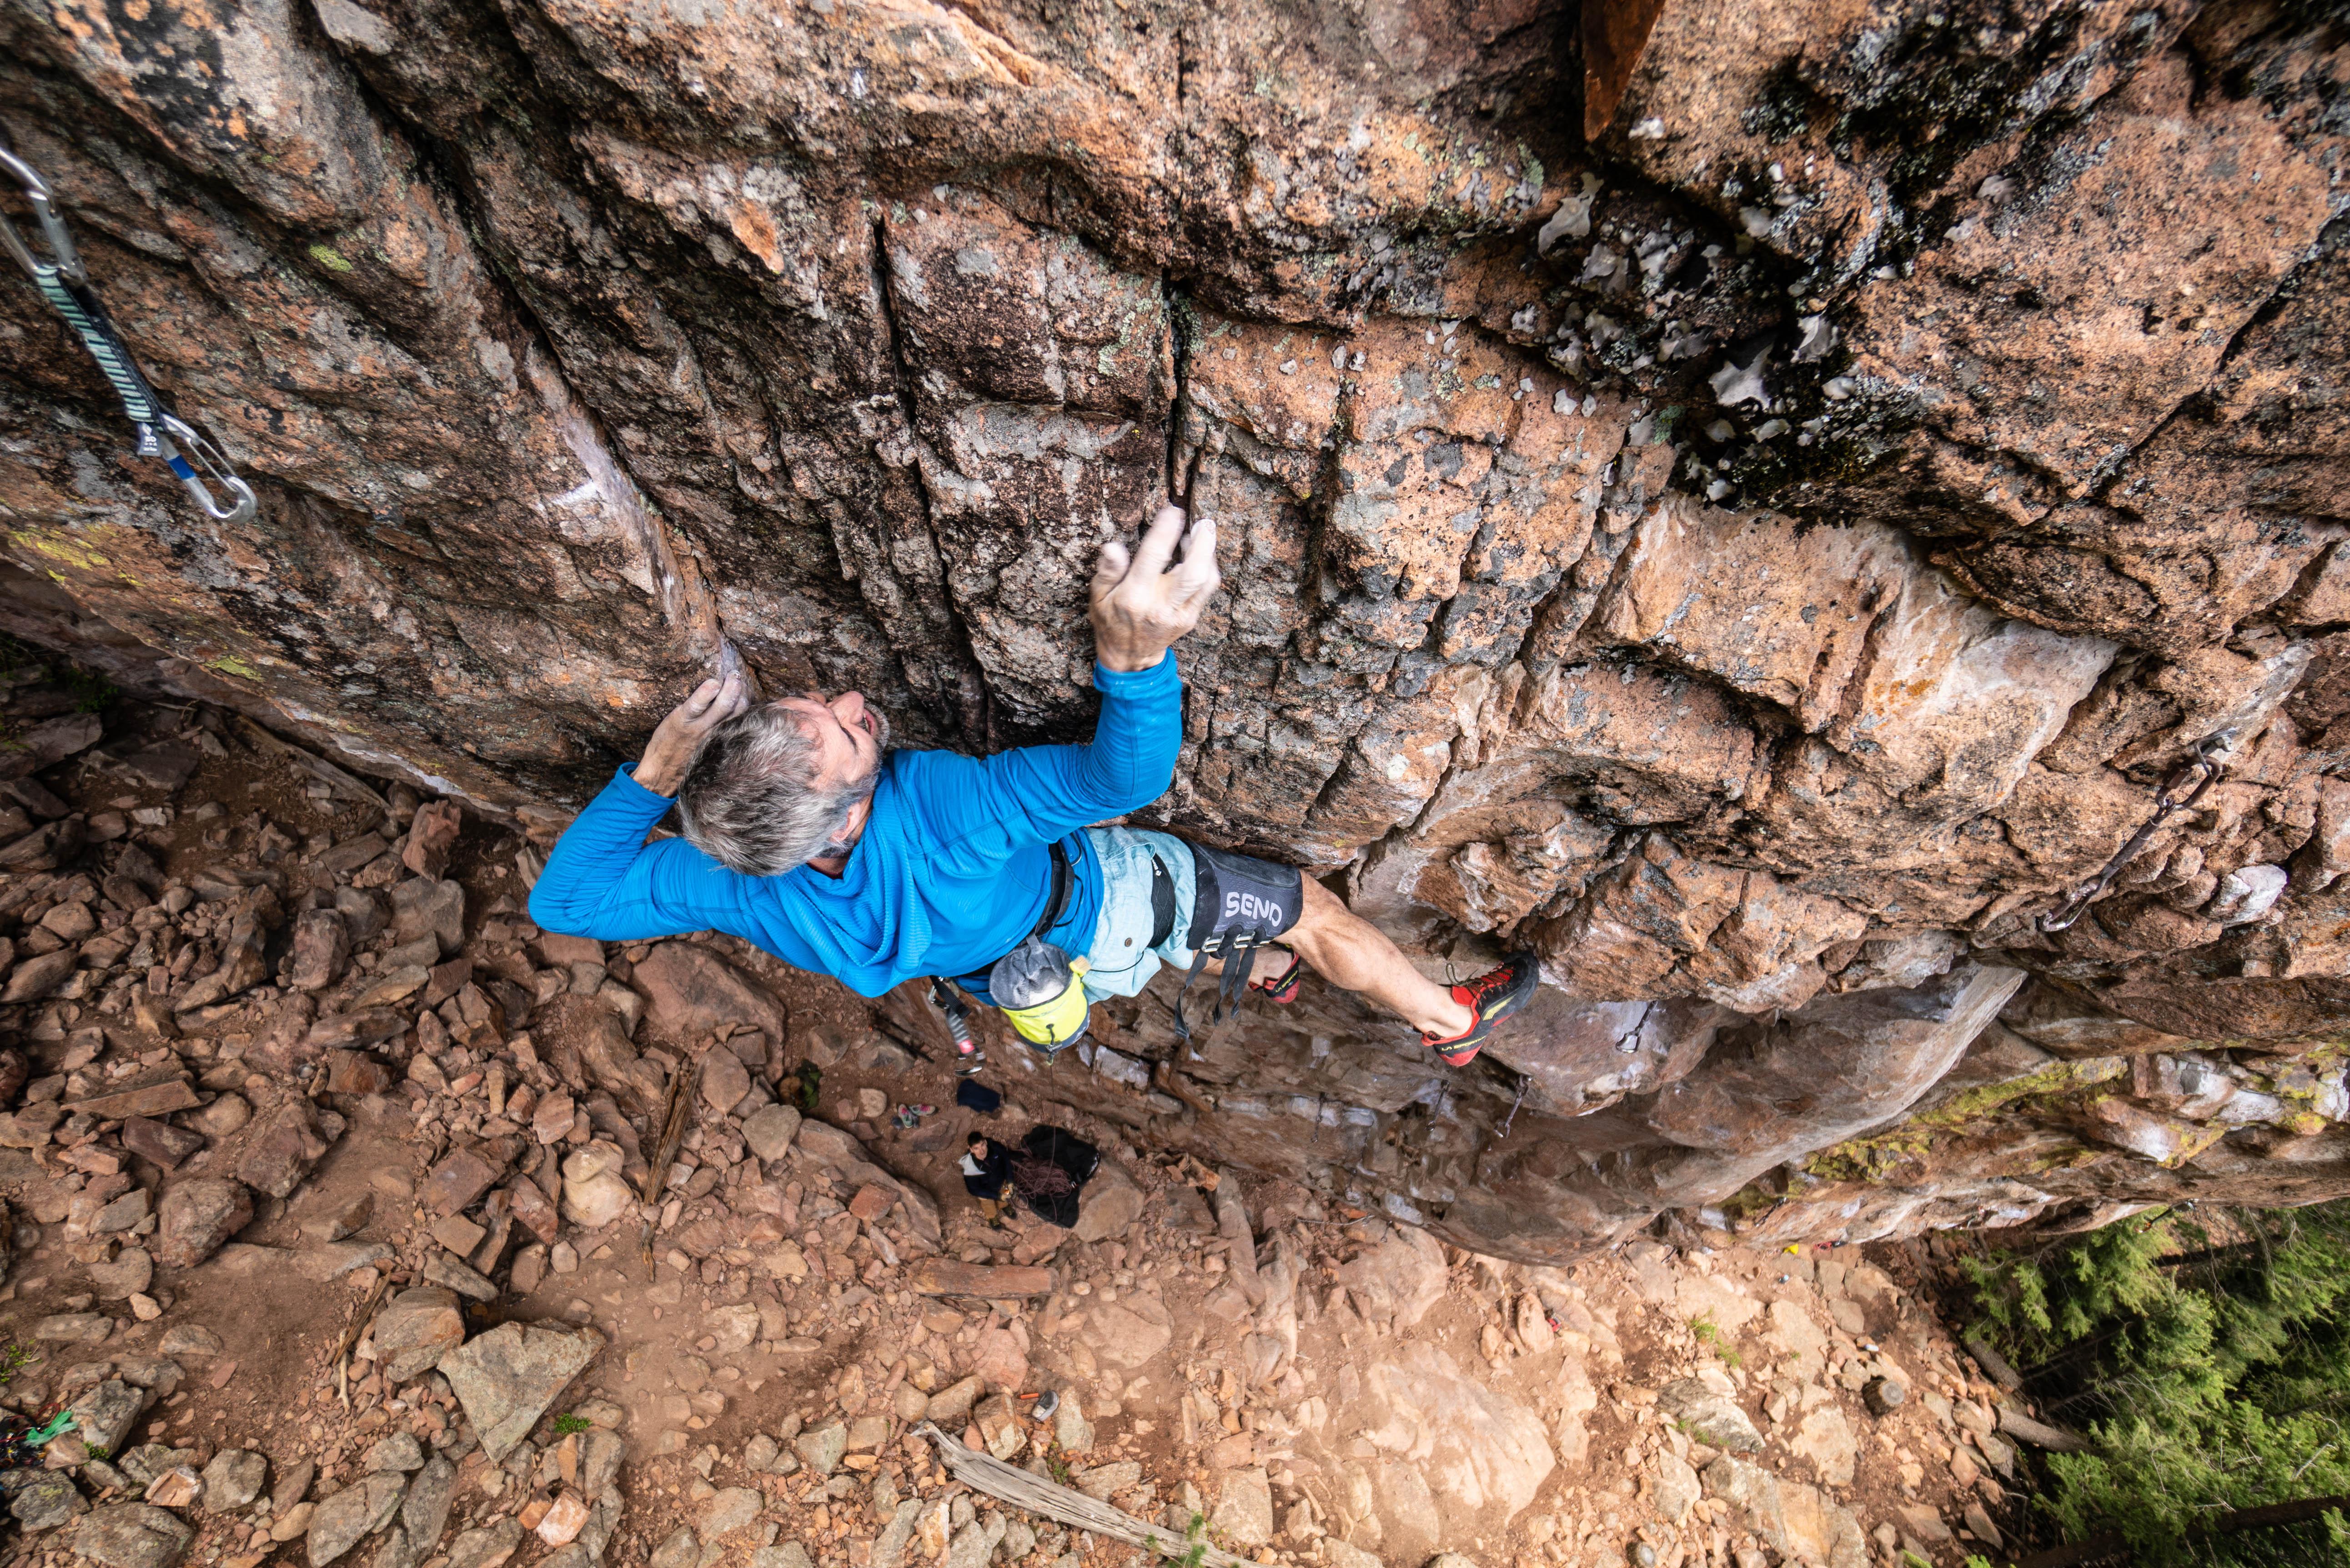 Wooden Climbing holds 8 crimps Rainy Day Holds crimp set.